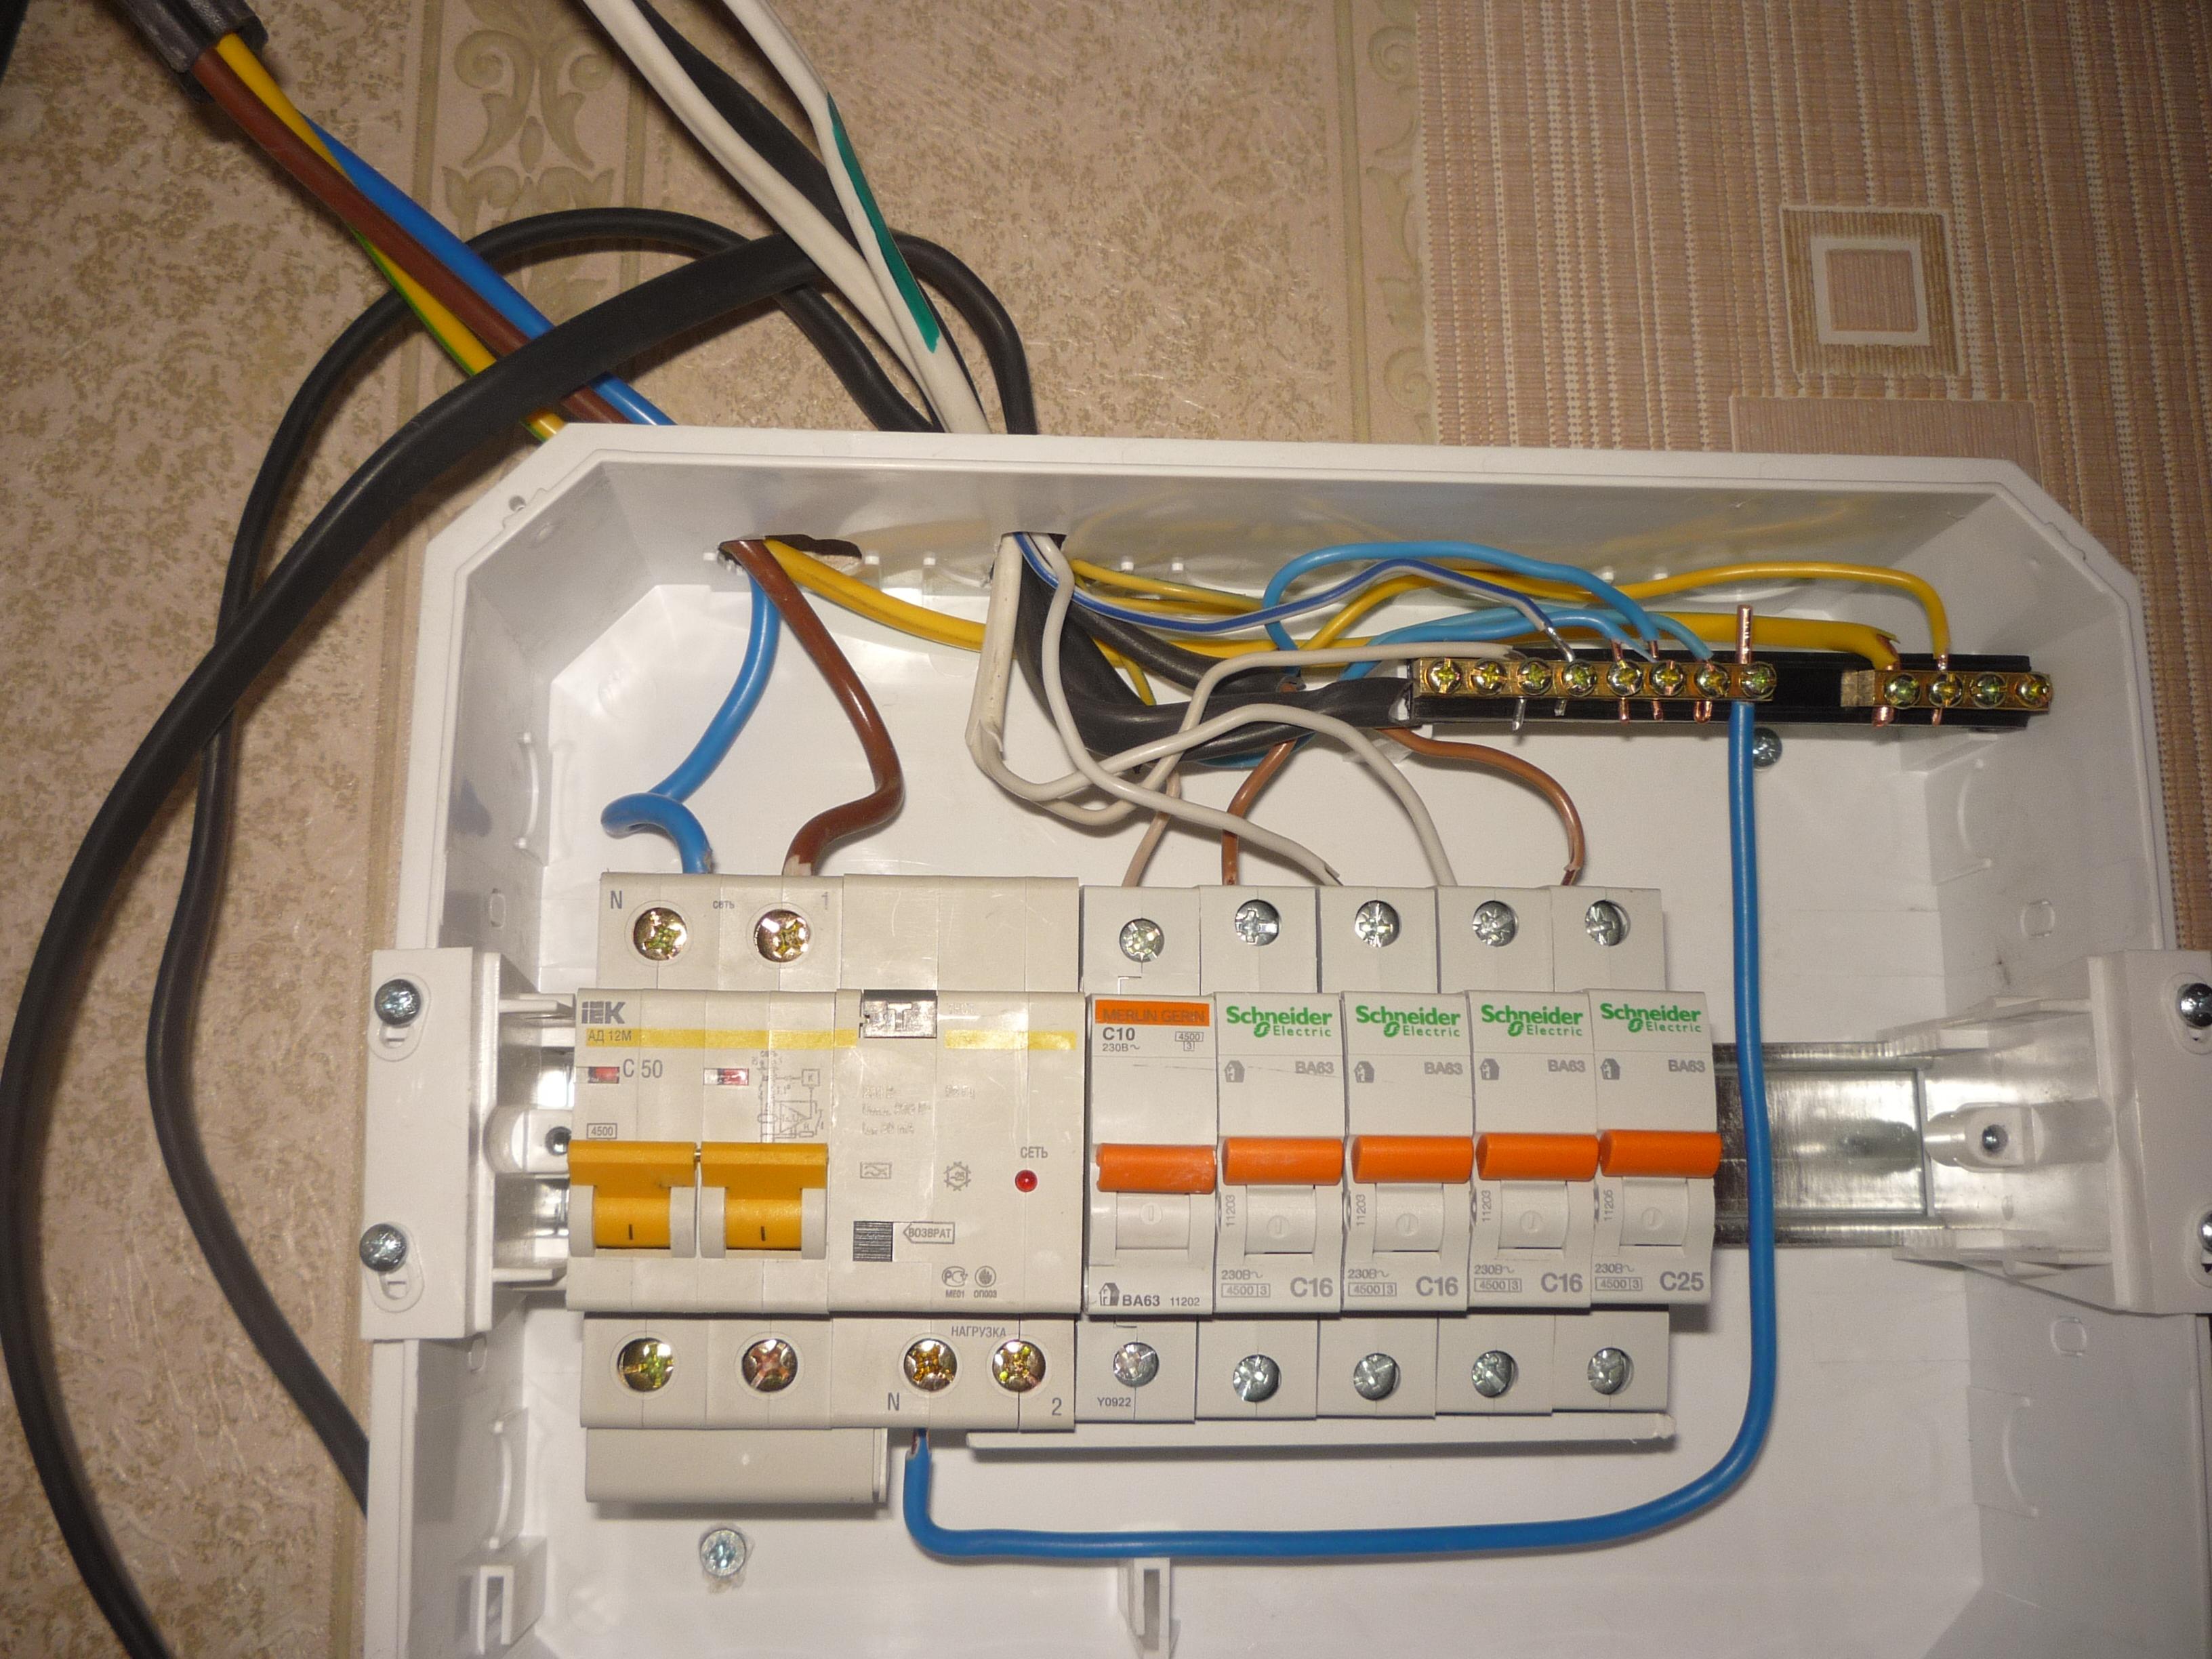 Электрический щиток схема подключения фото